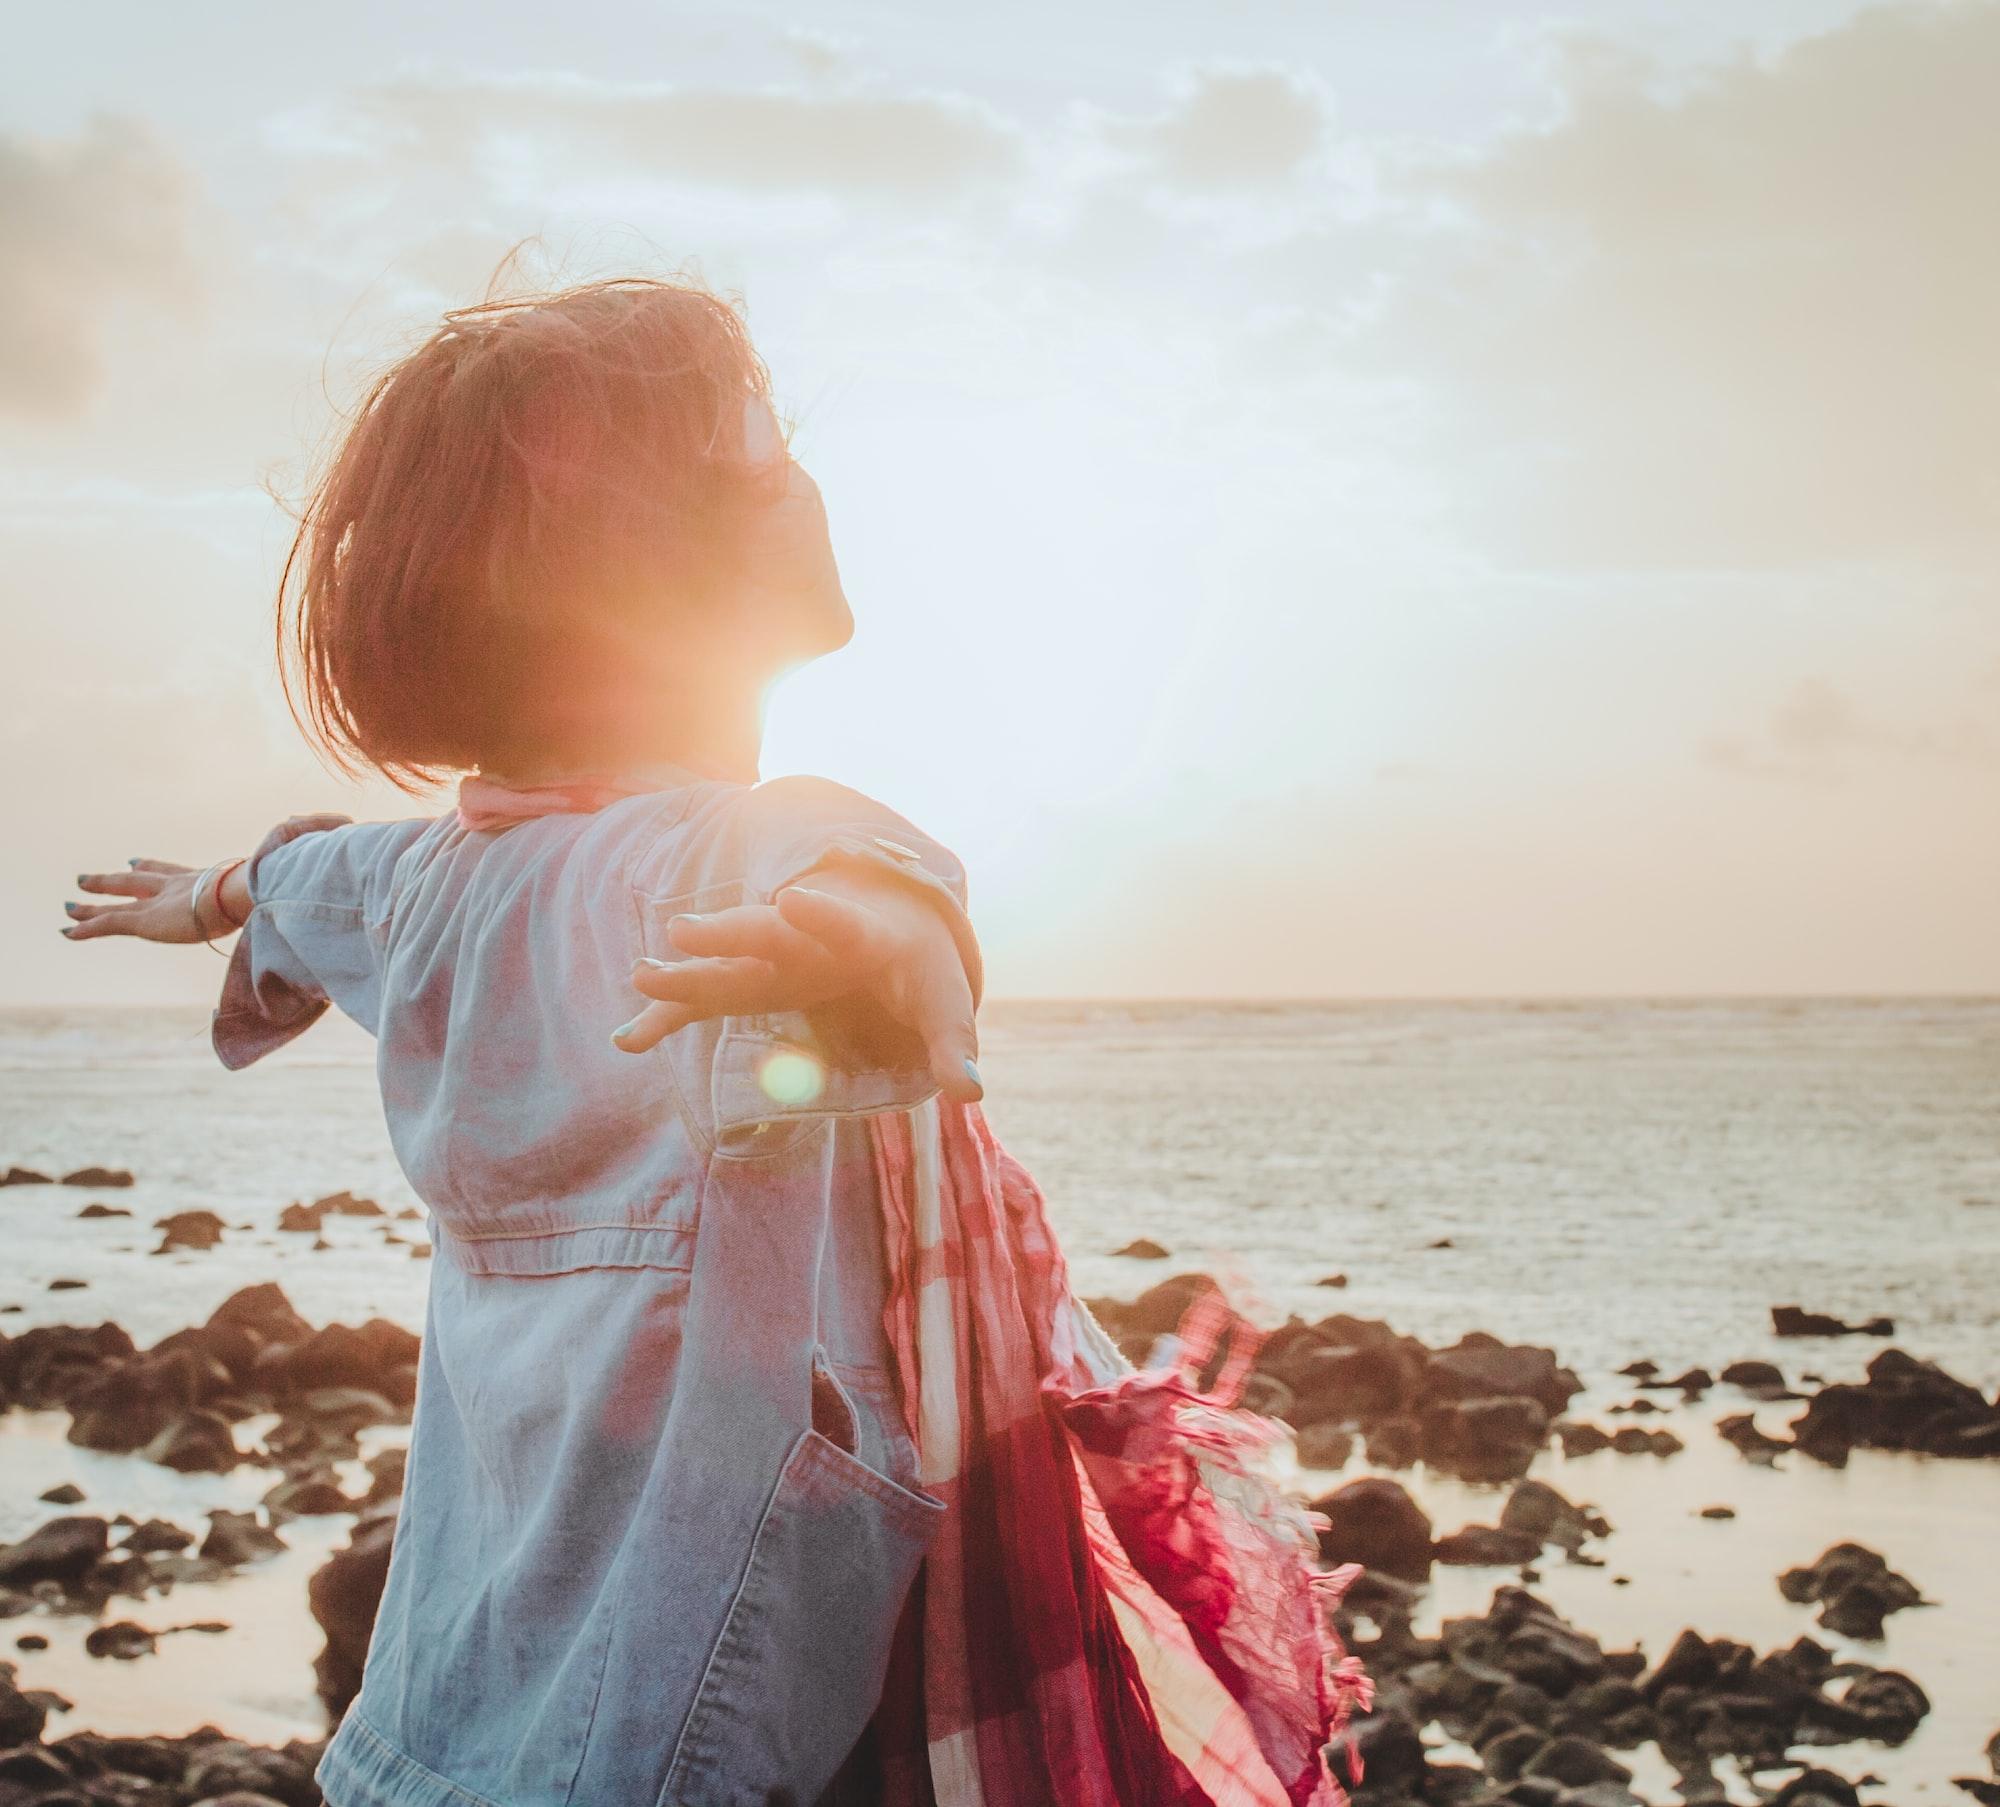 Gratitude Stories: Grateful for Life